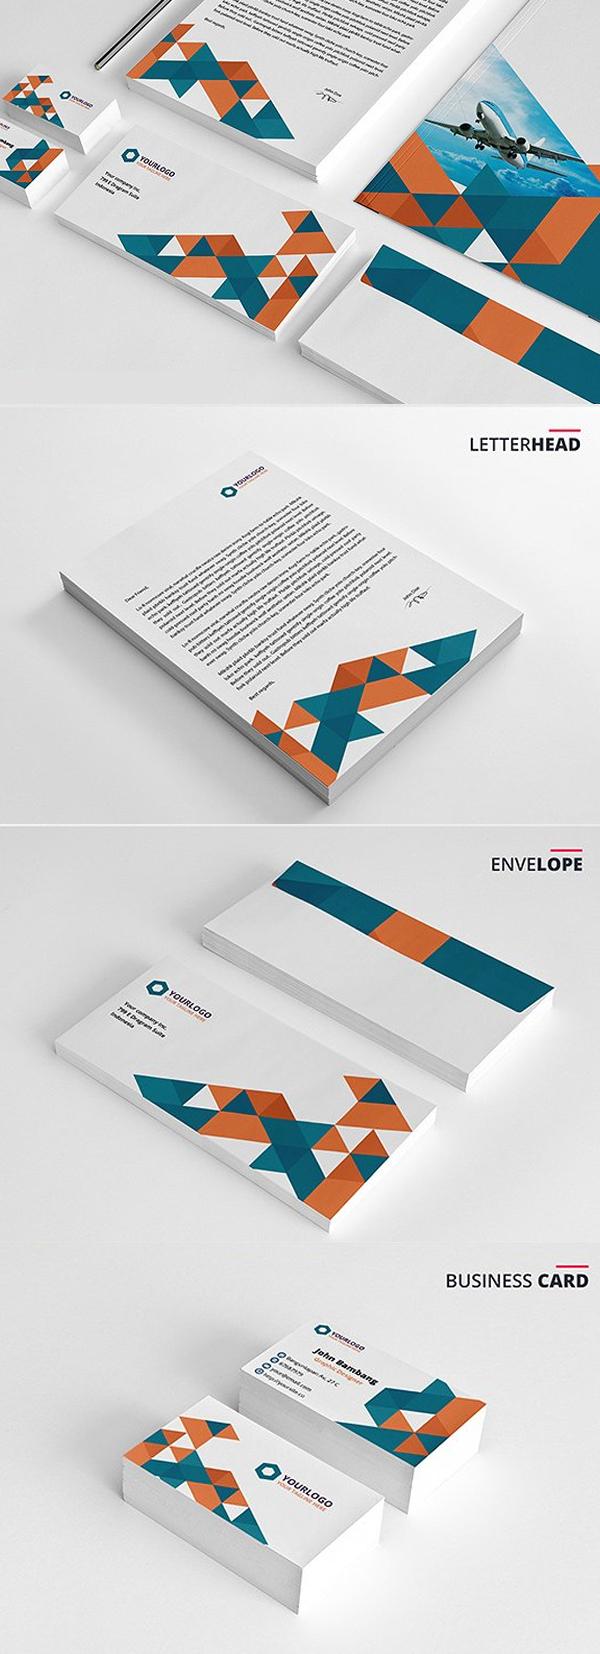 50 Professional Corporate Branding / Stationery Templates Design - 14